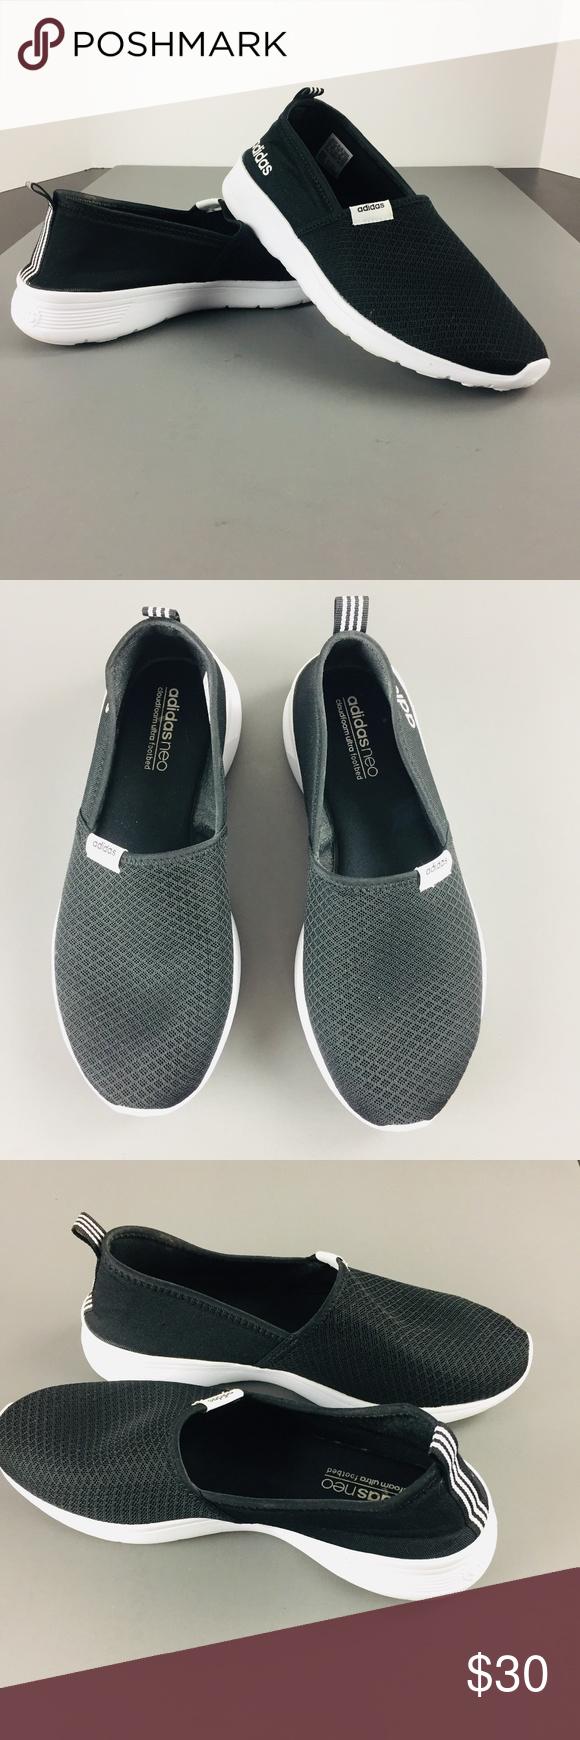 adidas neo shoes women